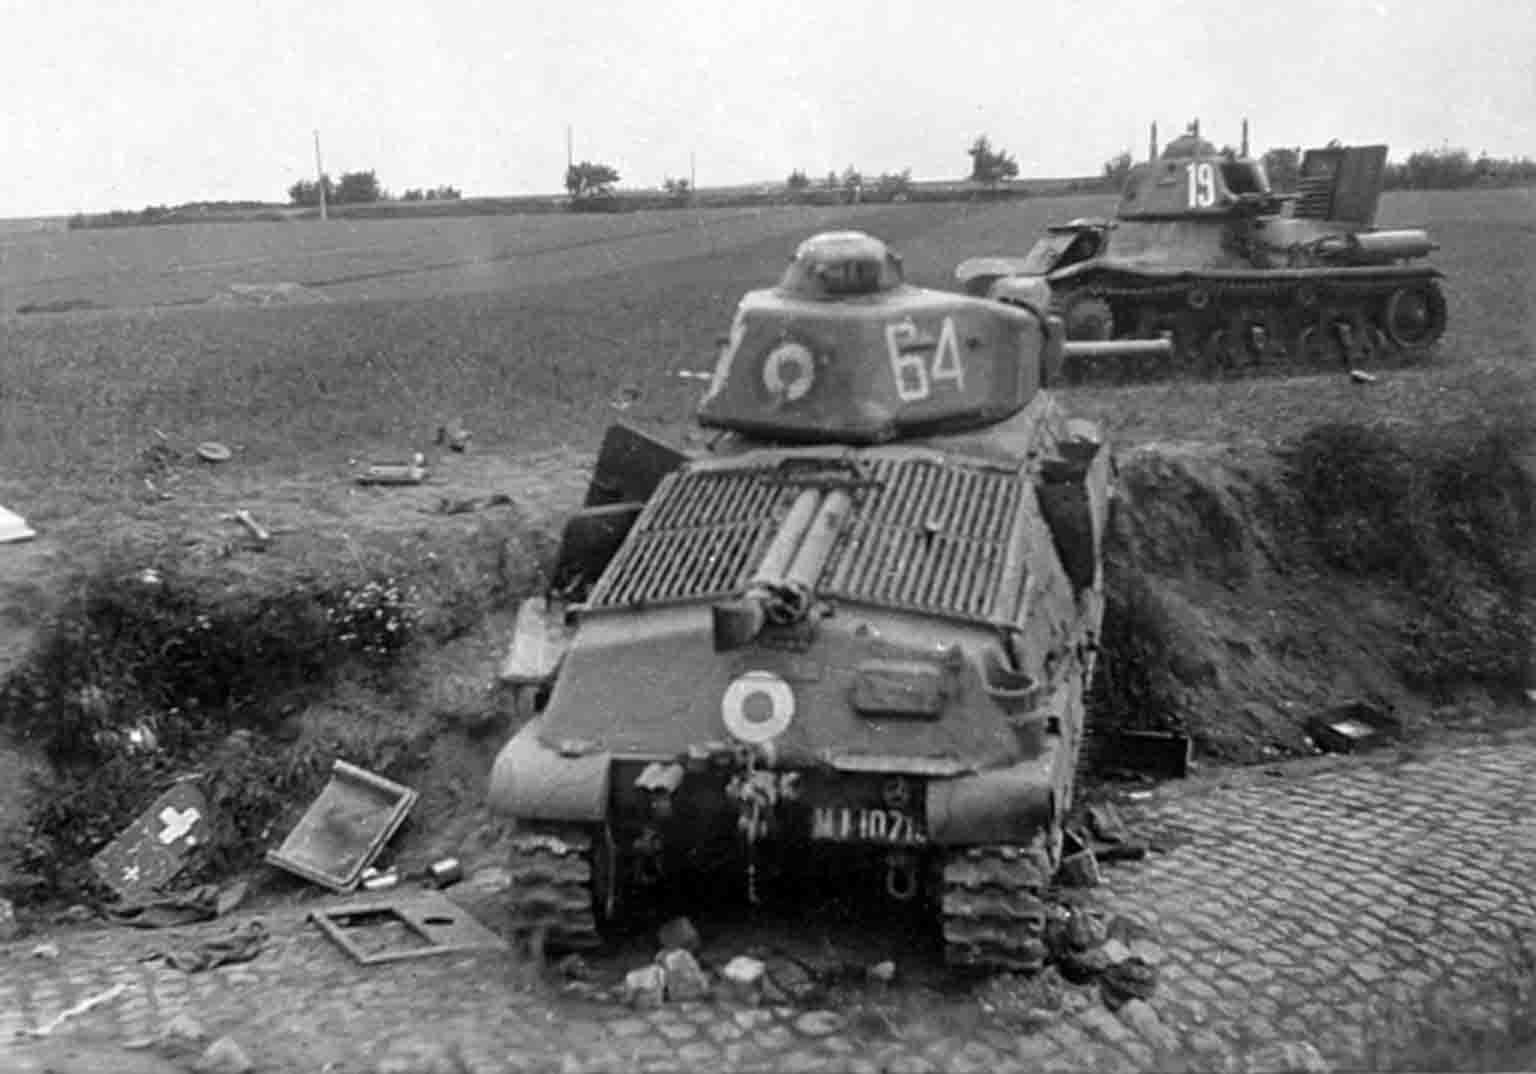 World War 2 - Hotchkiss H35, Somua S35